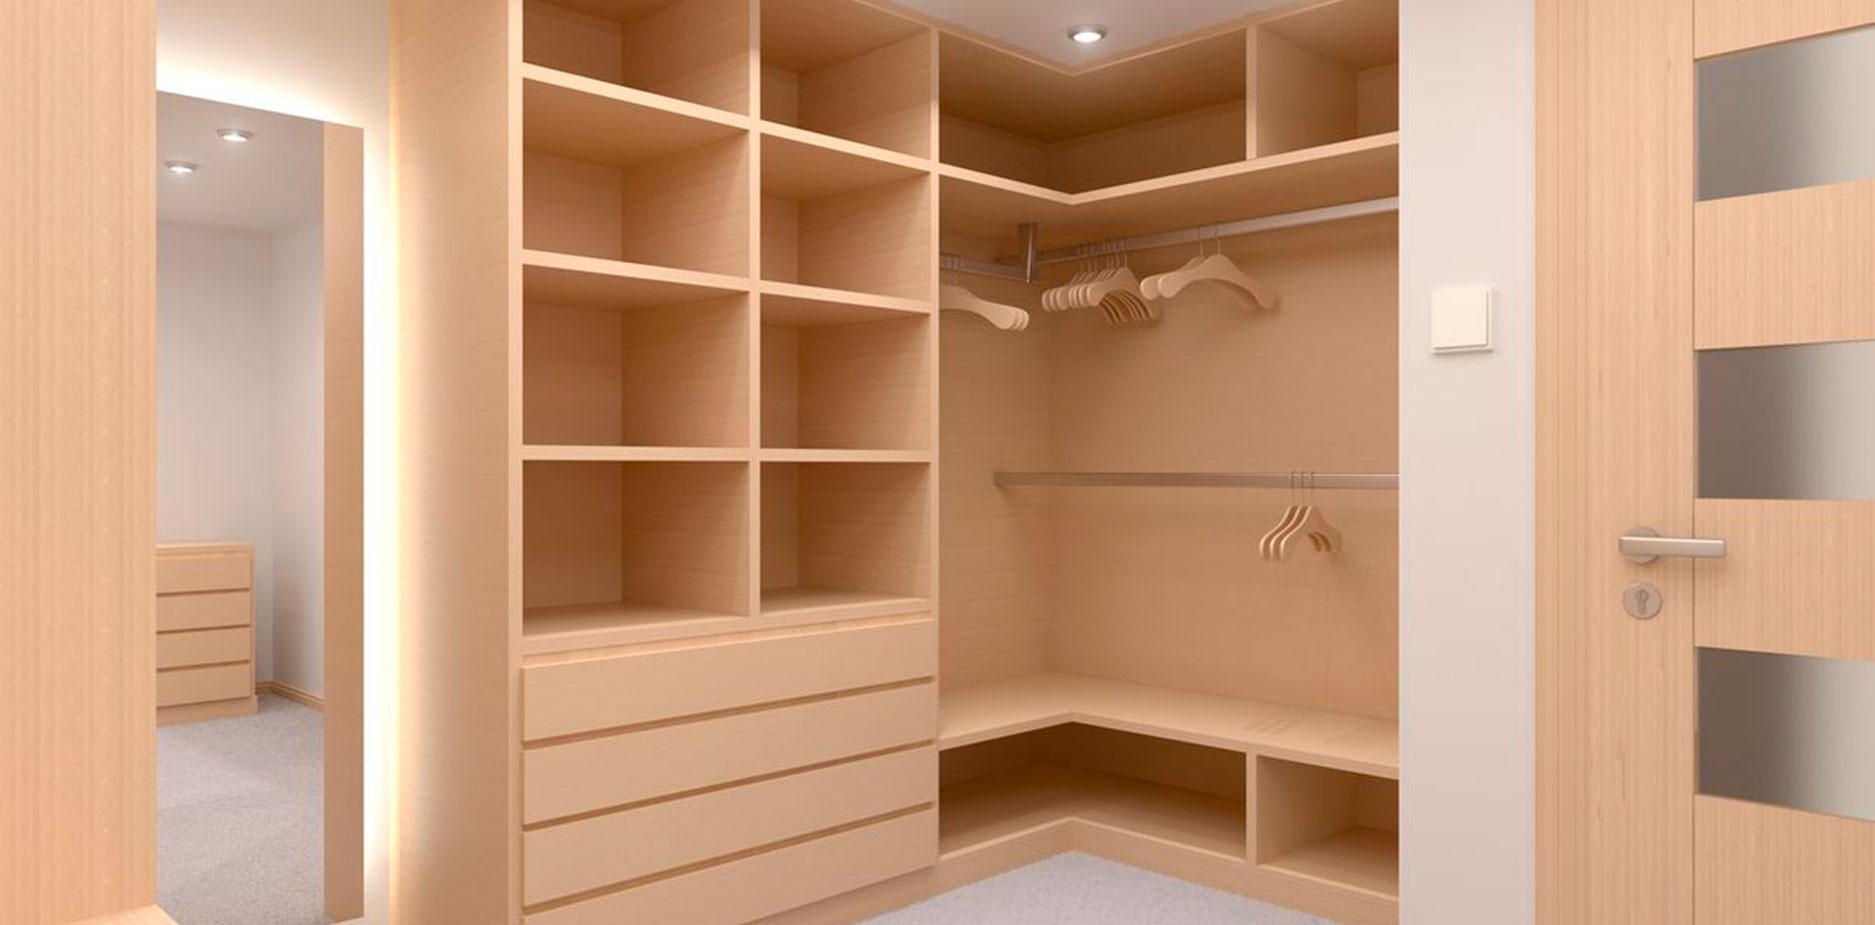 Fabrica de muebles a medidad muebles de ba o muebles cubreradiadores muejosala s l home - Muebles de madera a medida ...